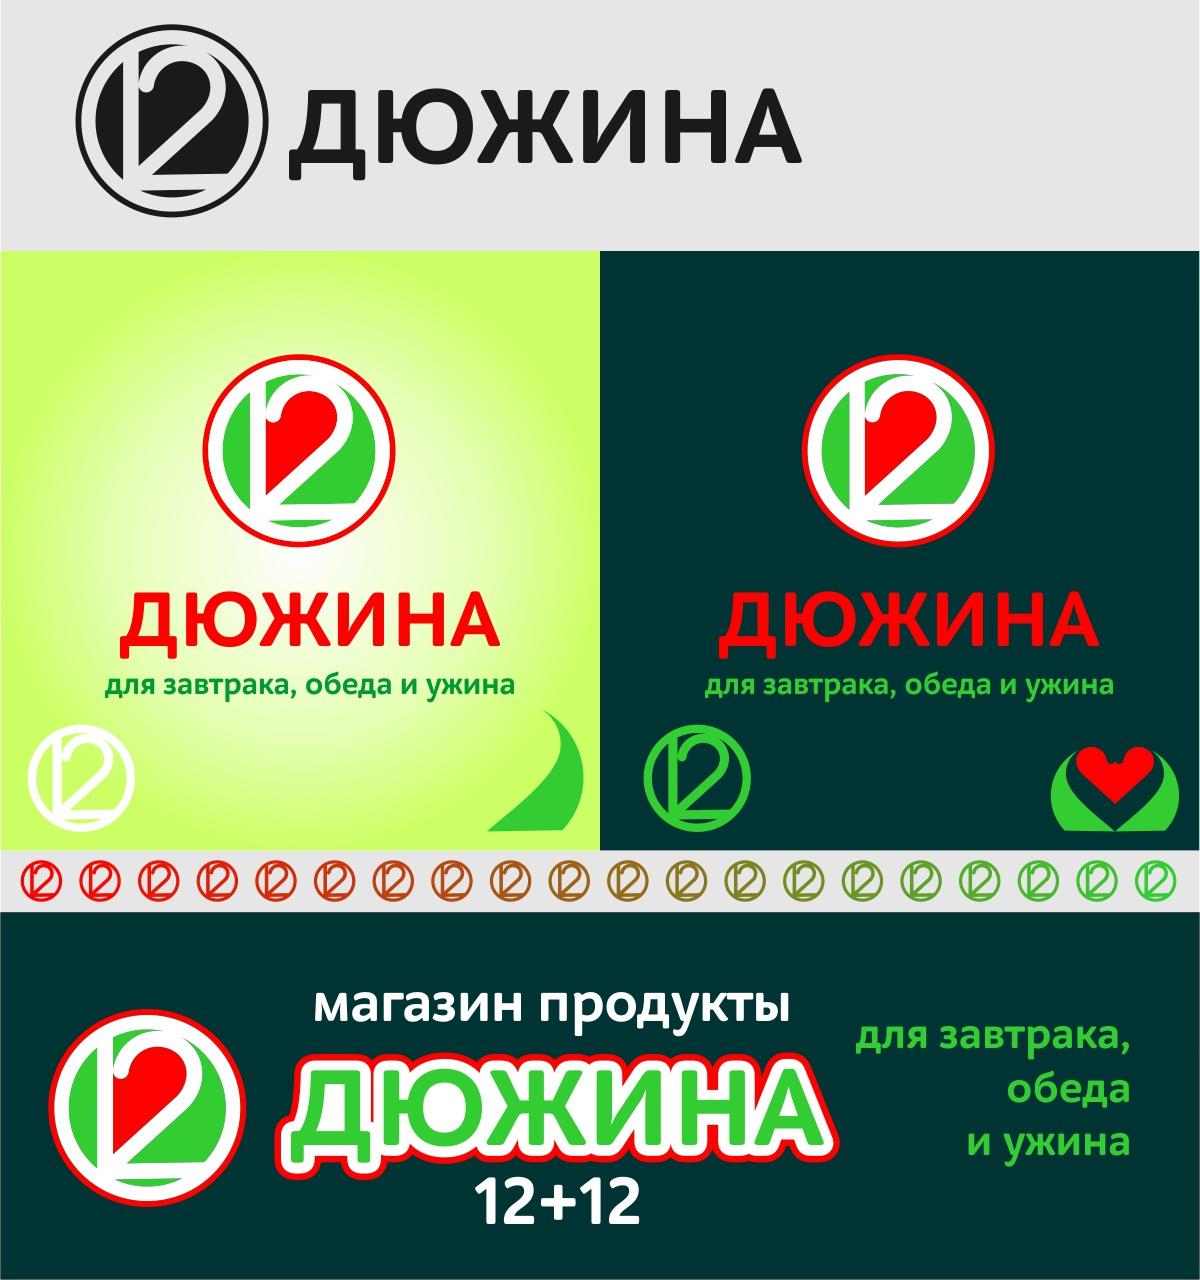 Нейминг + лого продуктовый минимаркет  фото f_4505c0ff8852b795.jpg